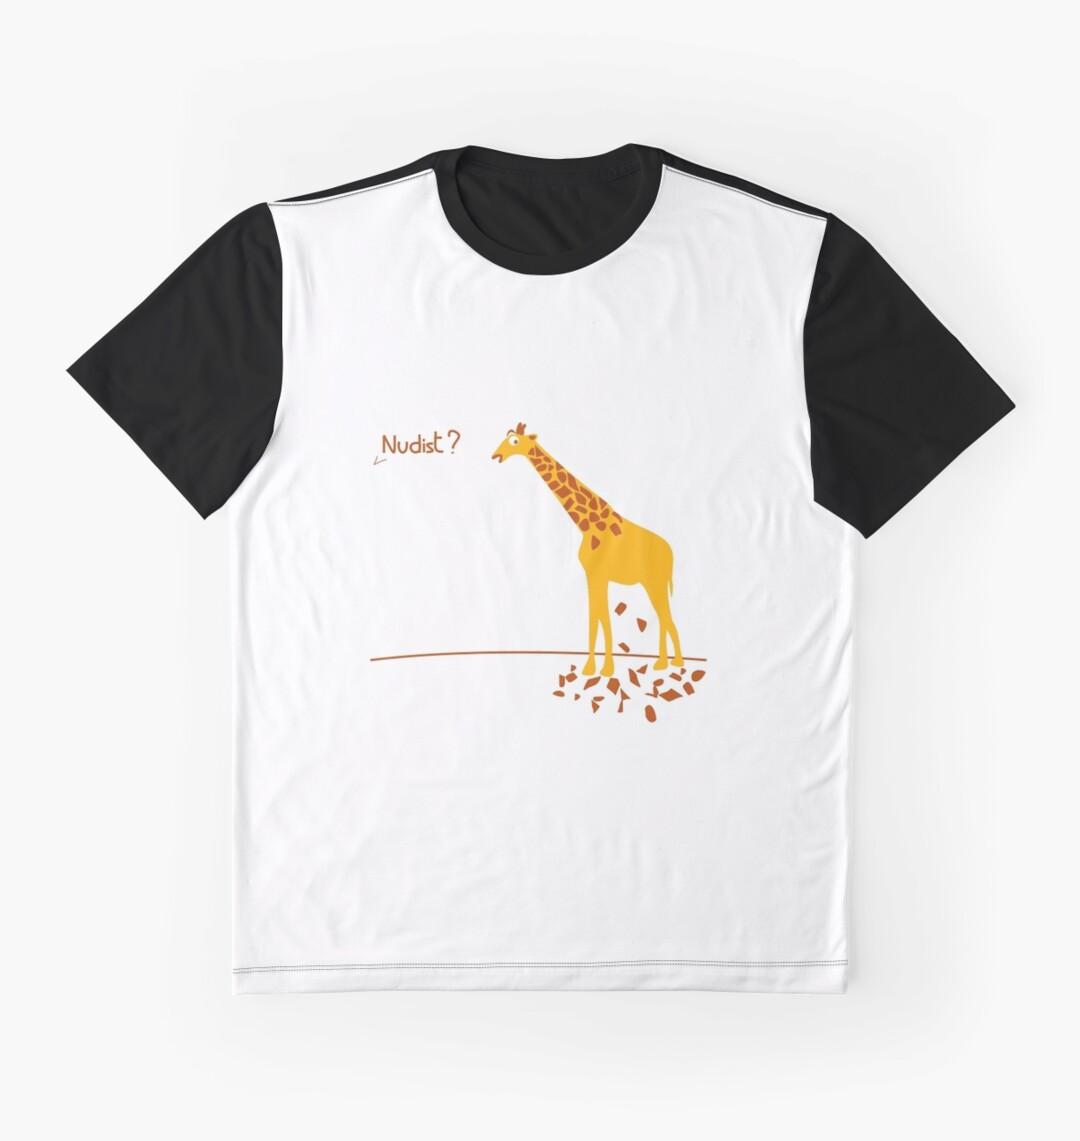 funnynudist funnynudist Funny Nudist Giraffe tshirt